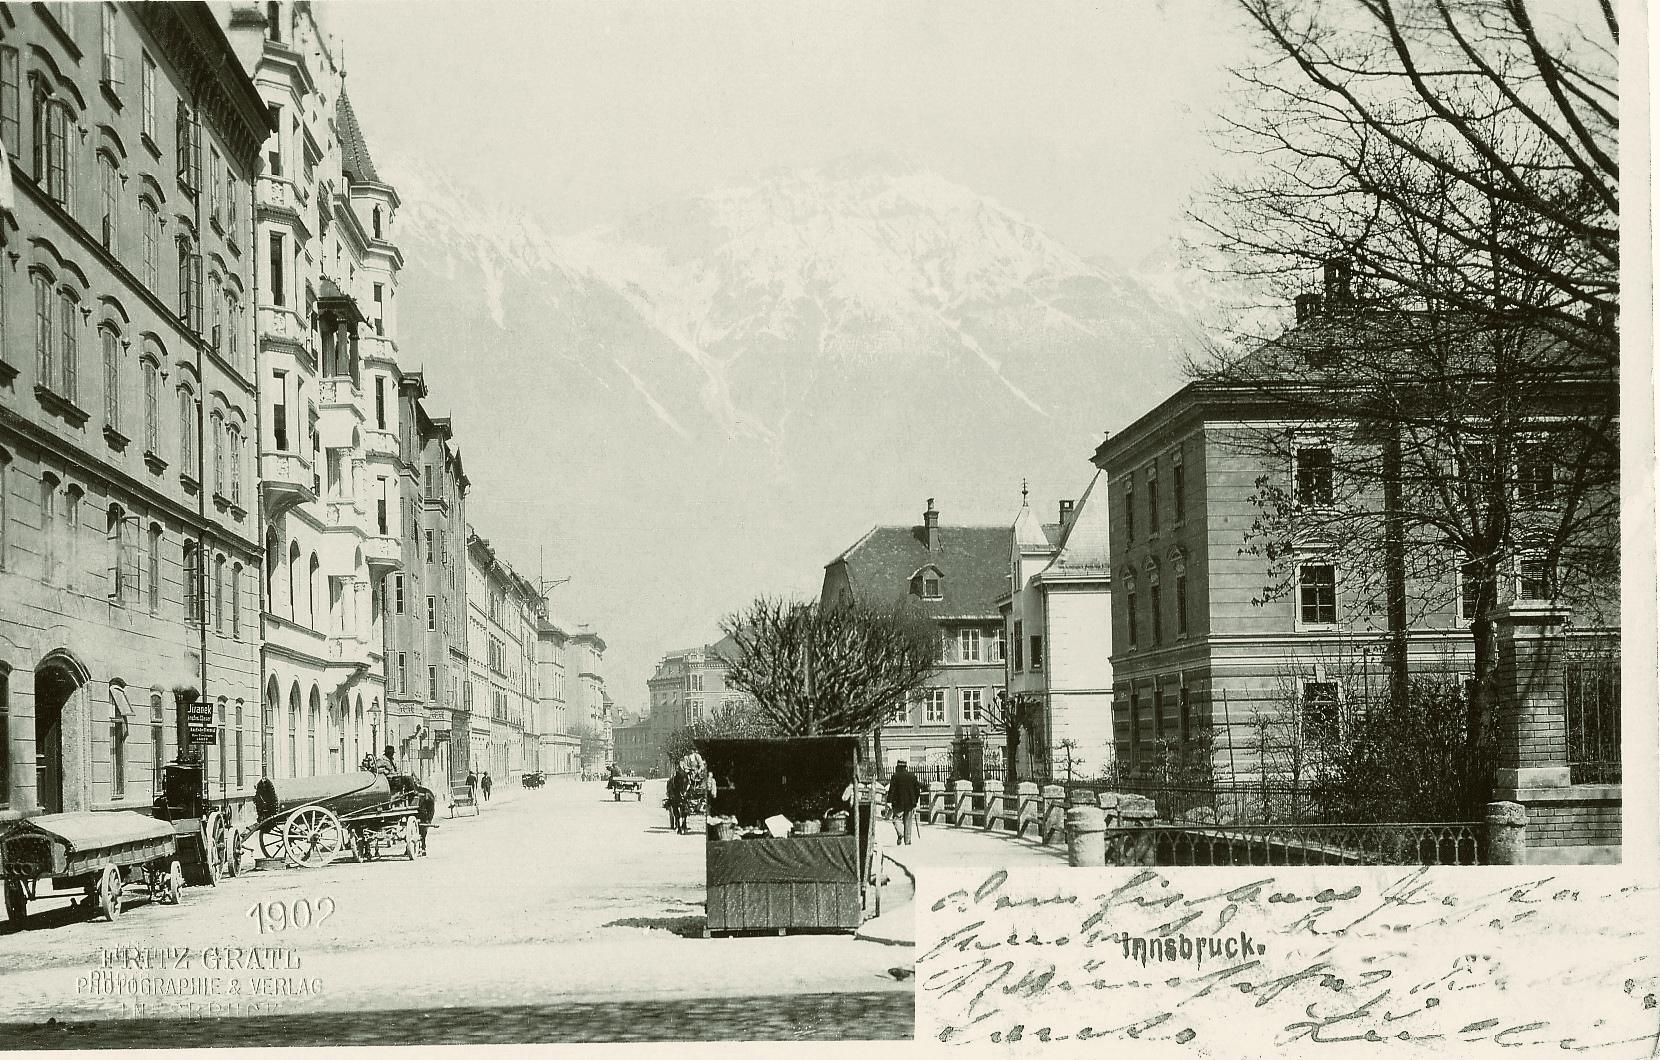 Innsbruck 1902